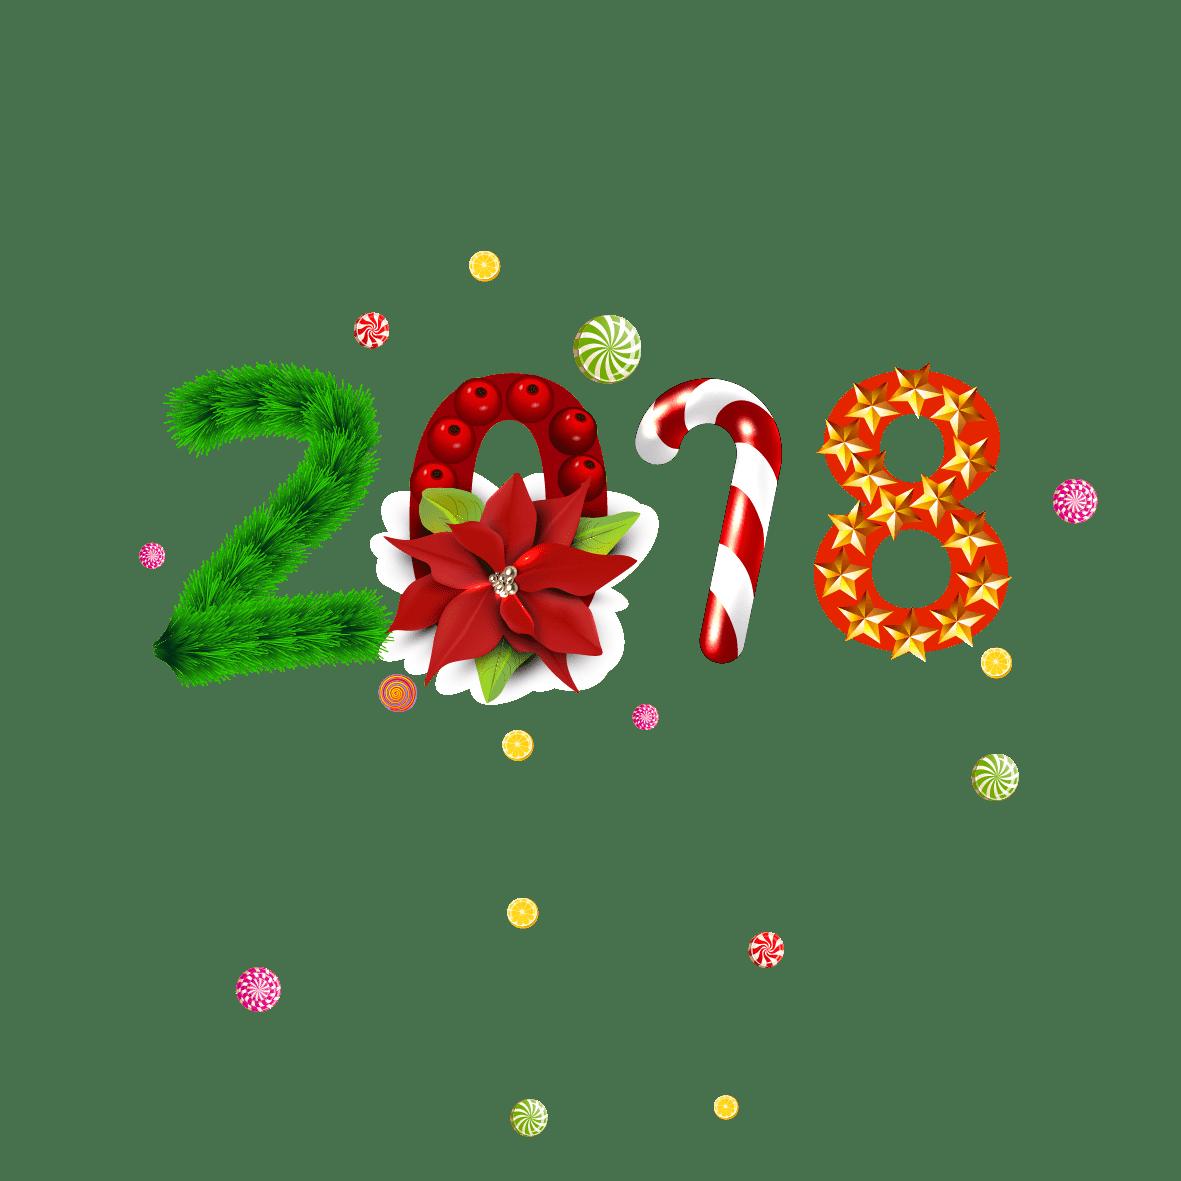 2018 PNG Image